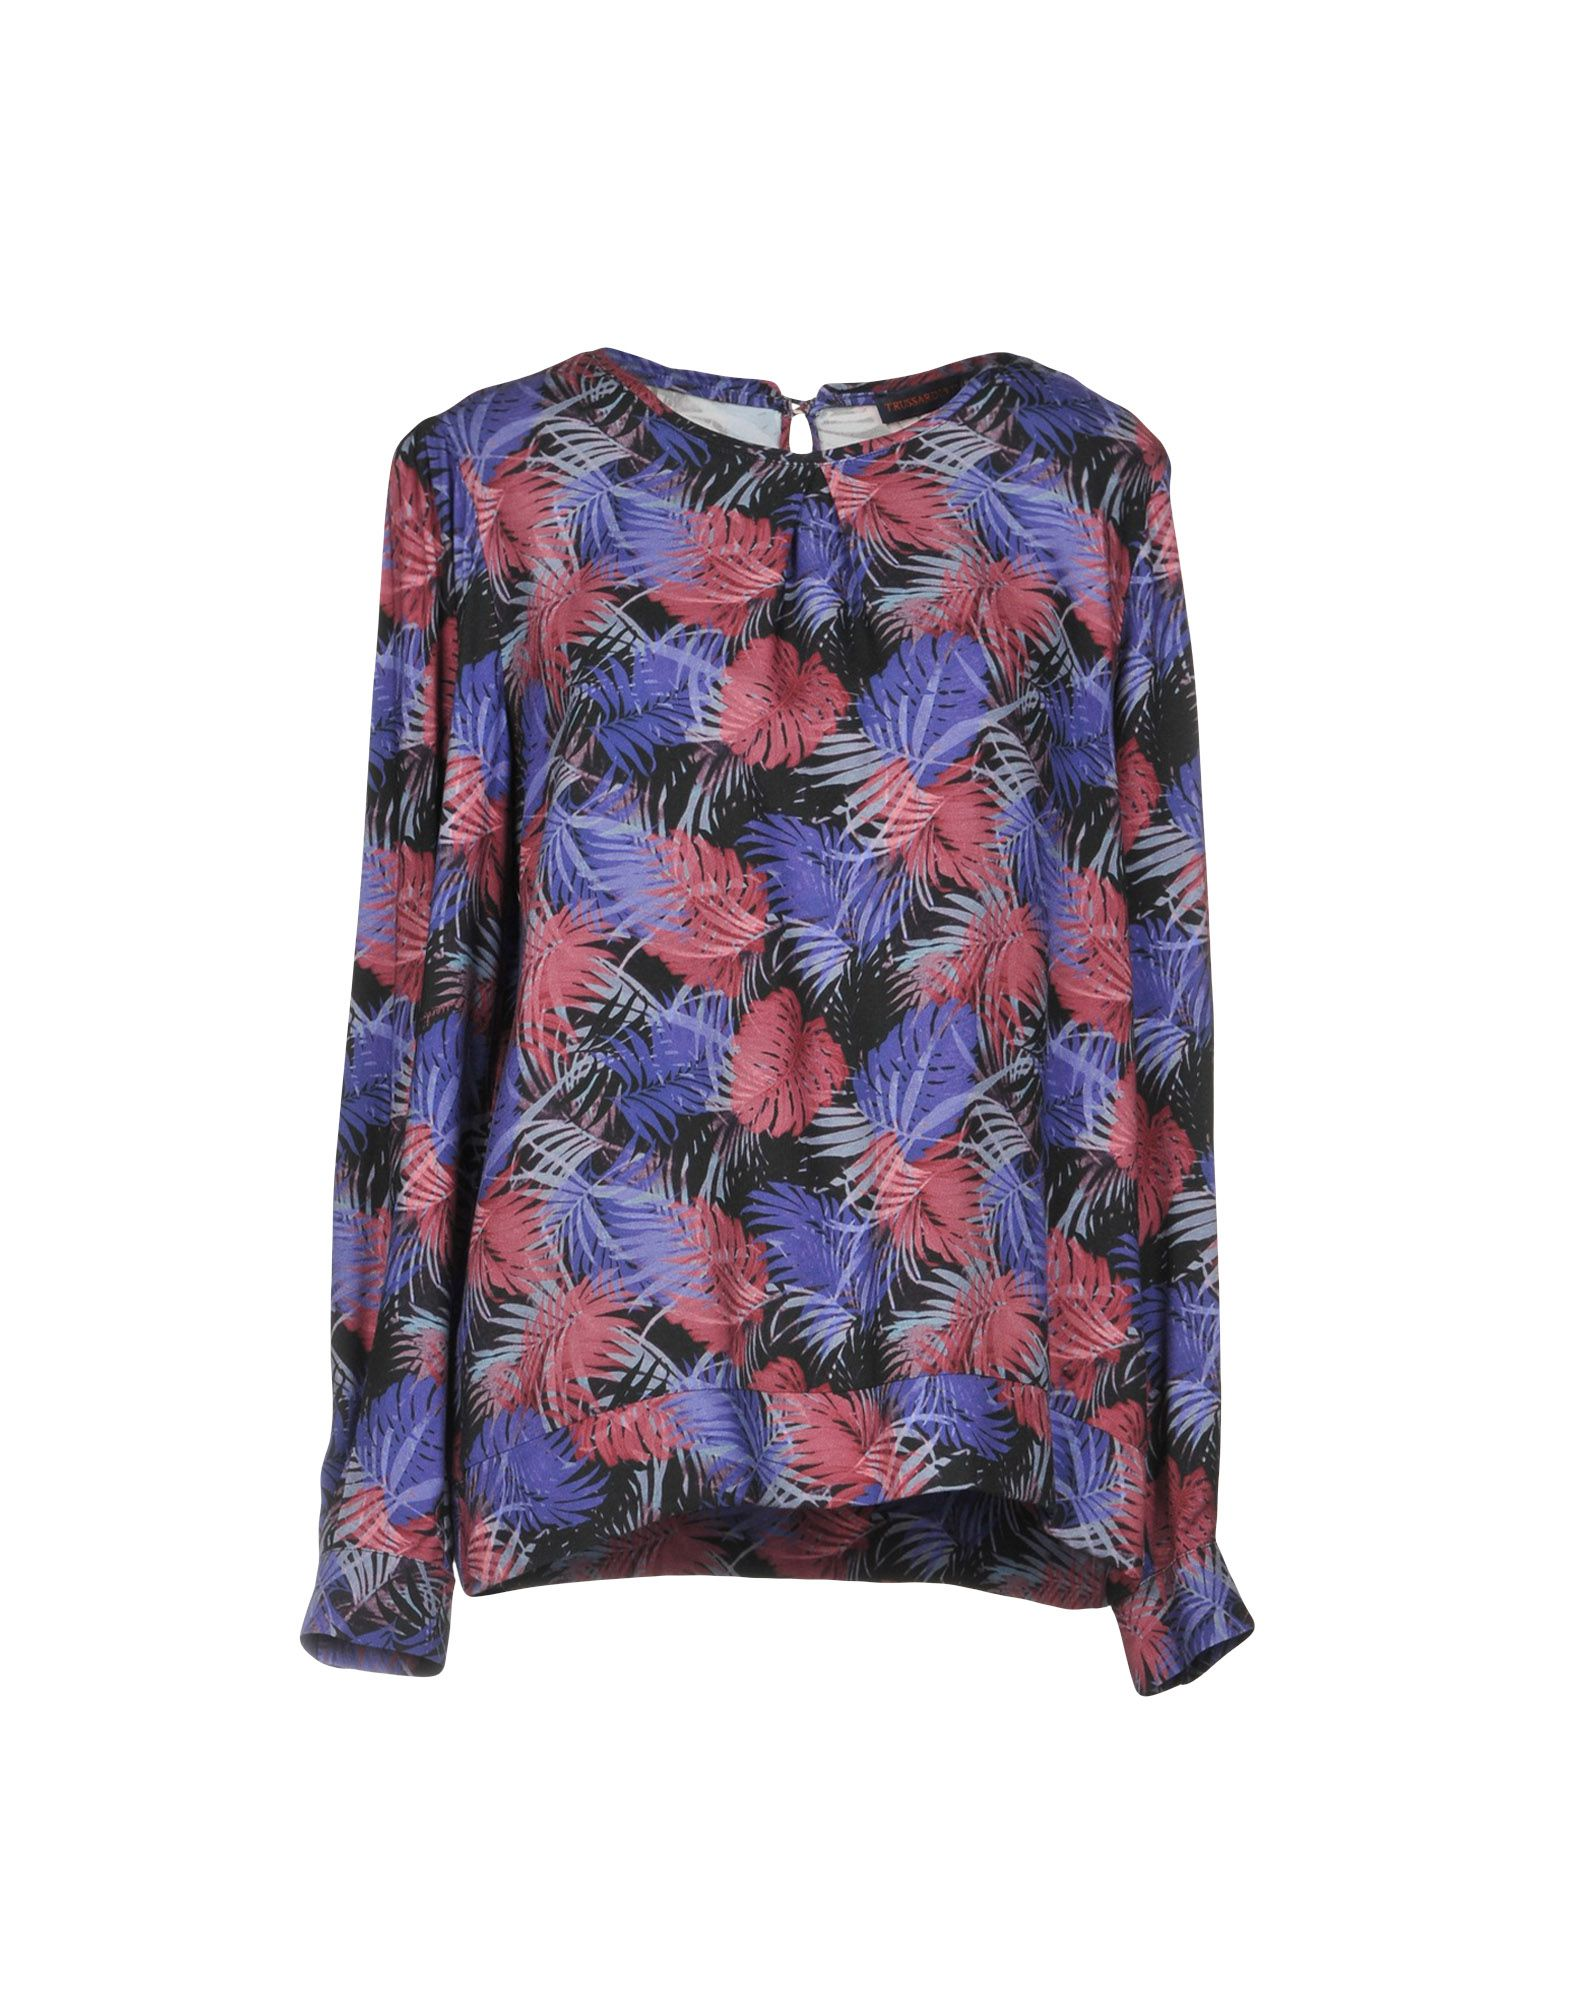 TRUSSARDI JEANS Блузка trussardi jeans блузка